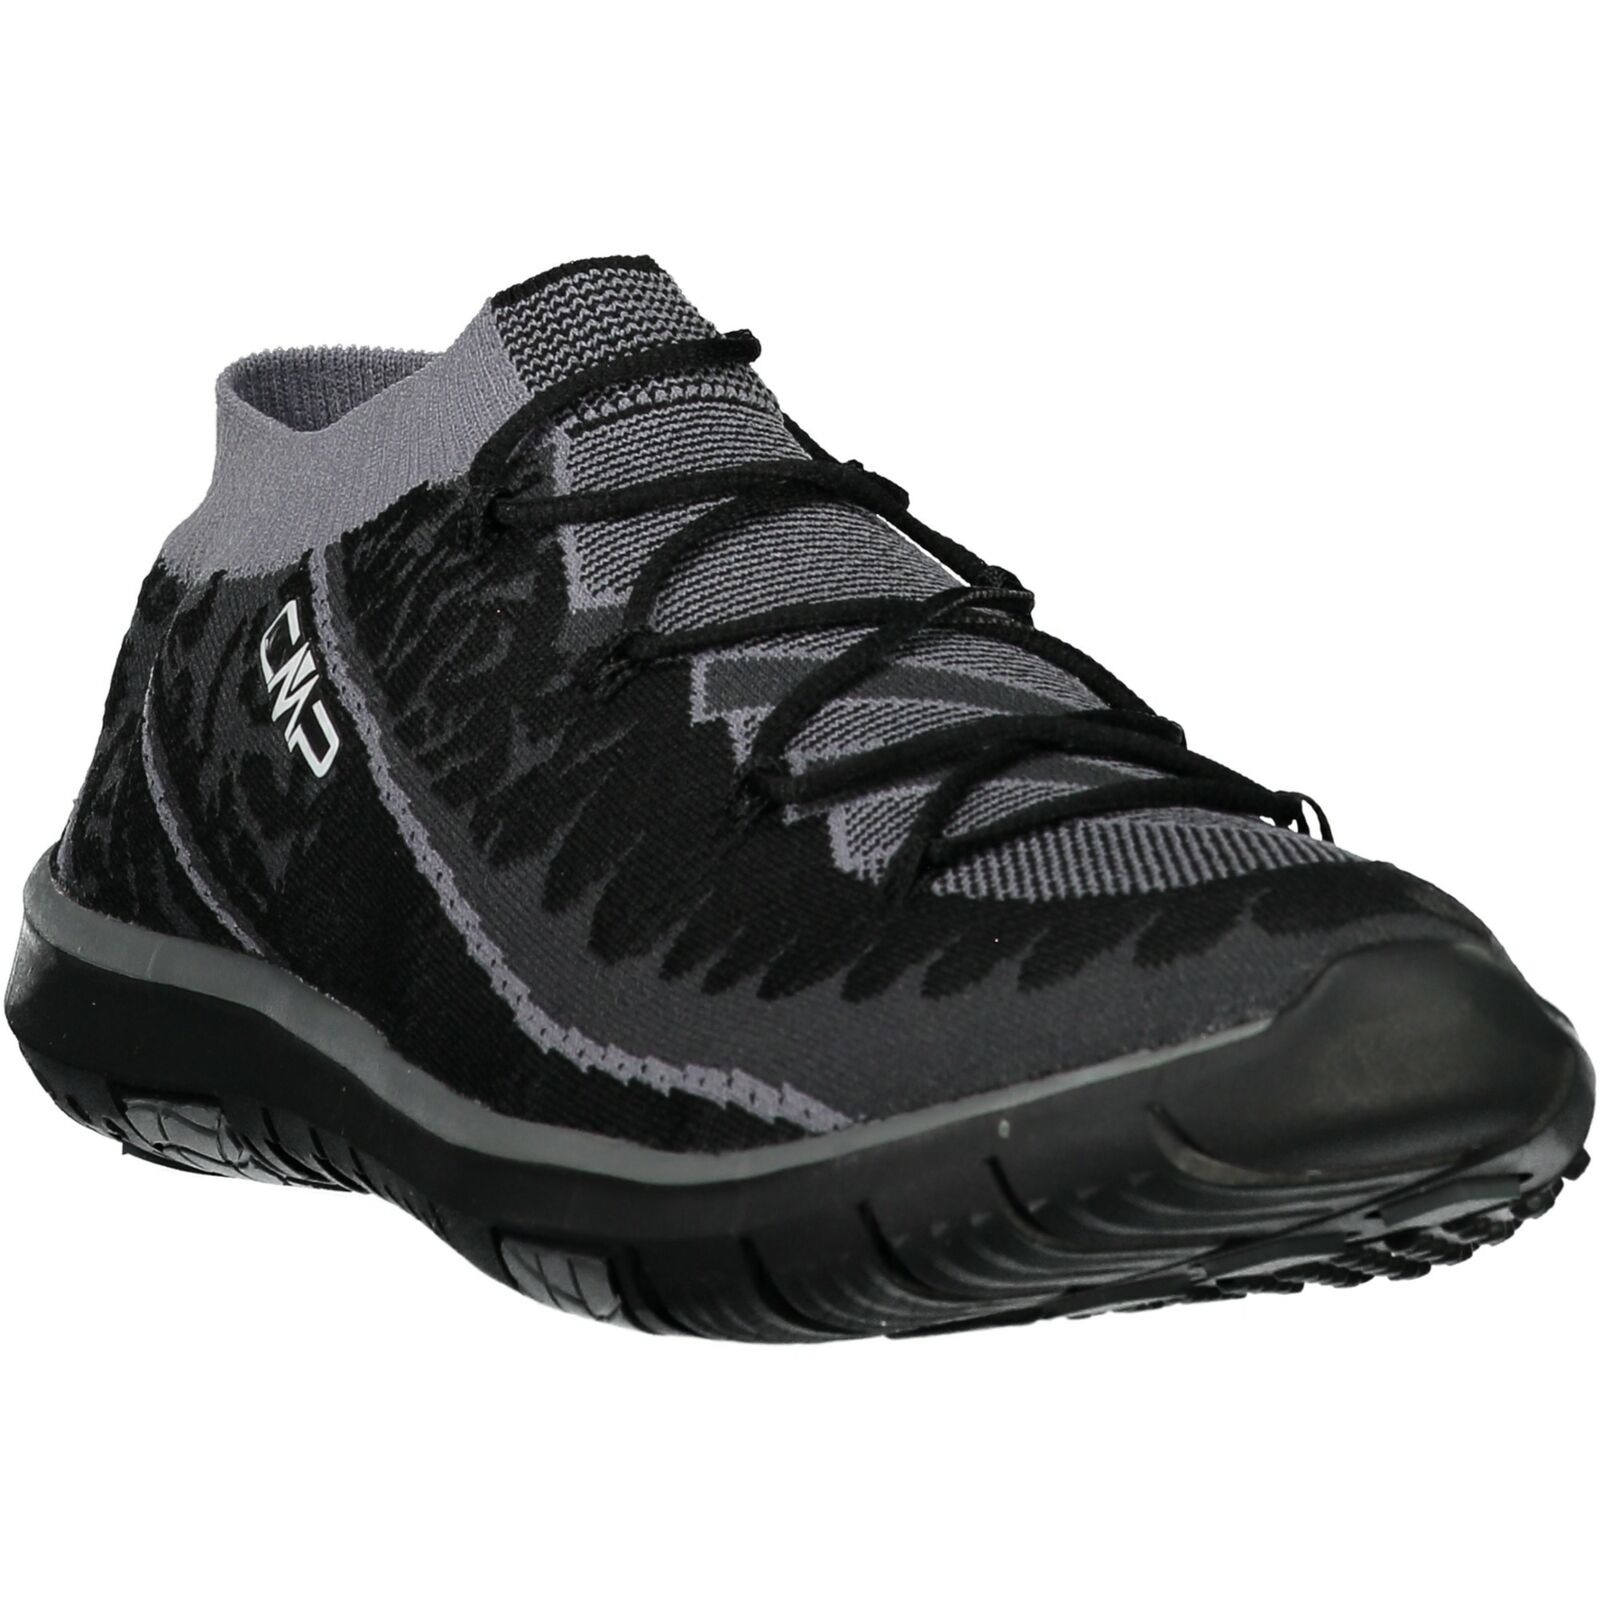 CMP Turnschuhe Sportschuhe Chamaeleontis Nimble Fitness shoes black leicht